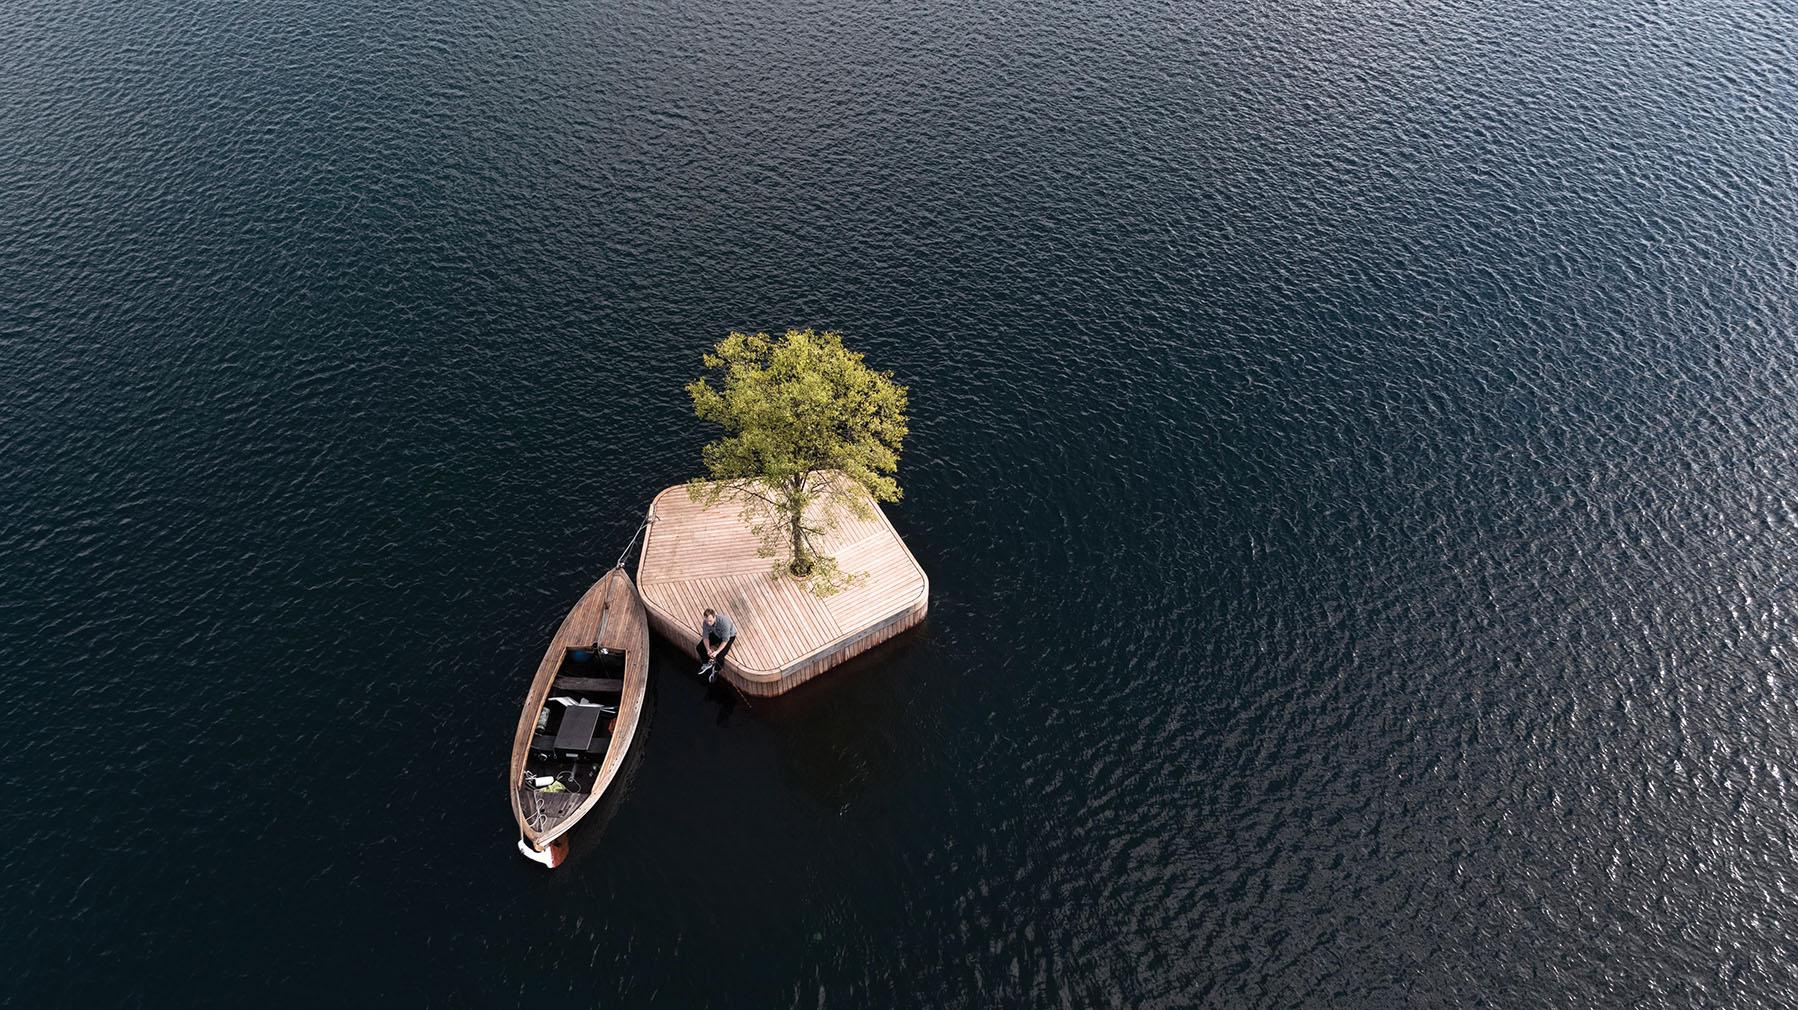 Copenhagen Islands floating platforms, designed by Marshall Blecher and Magnus Maarbjerg